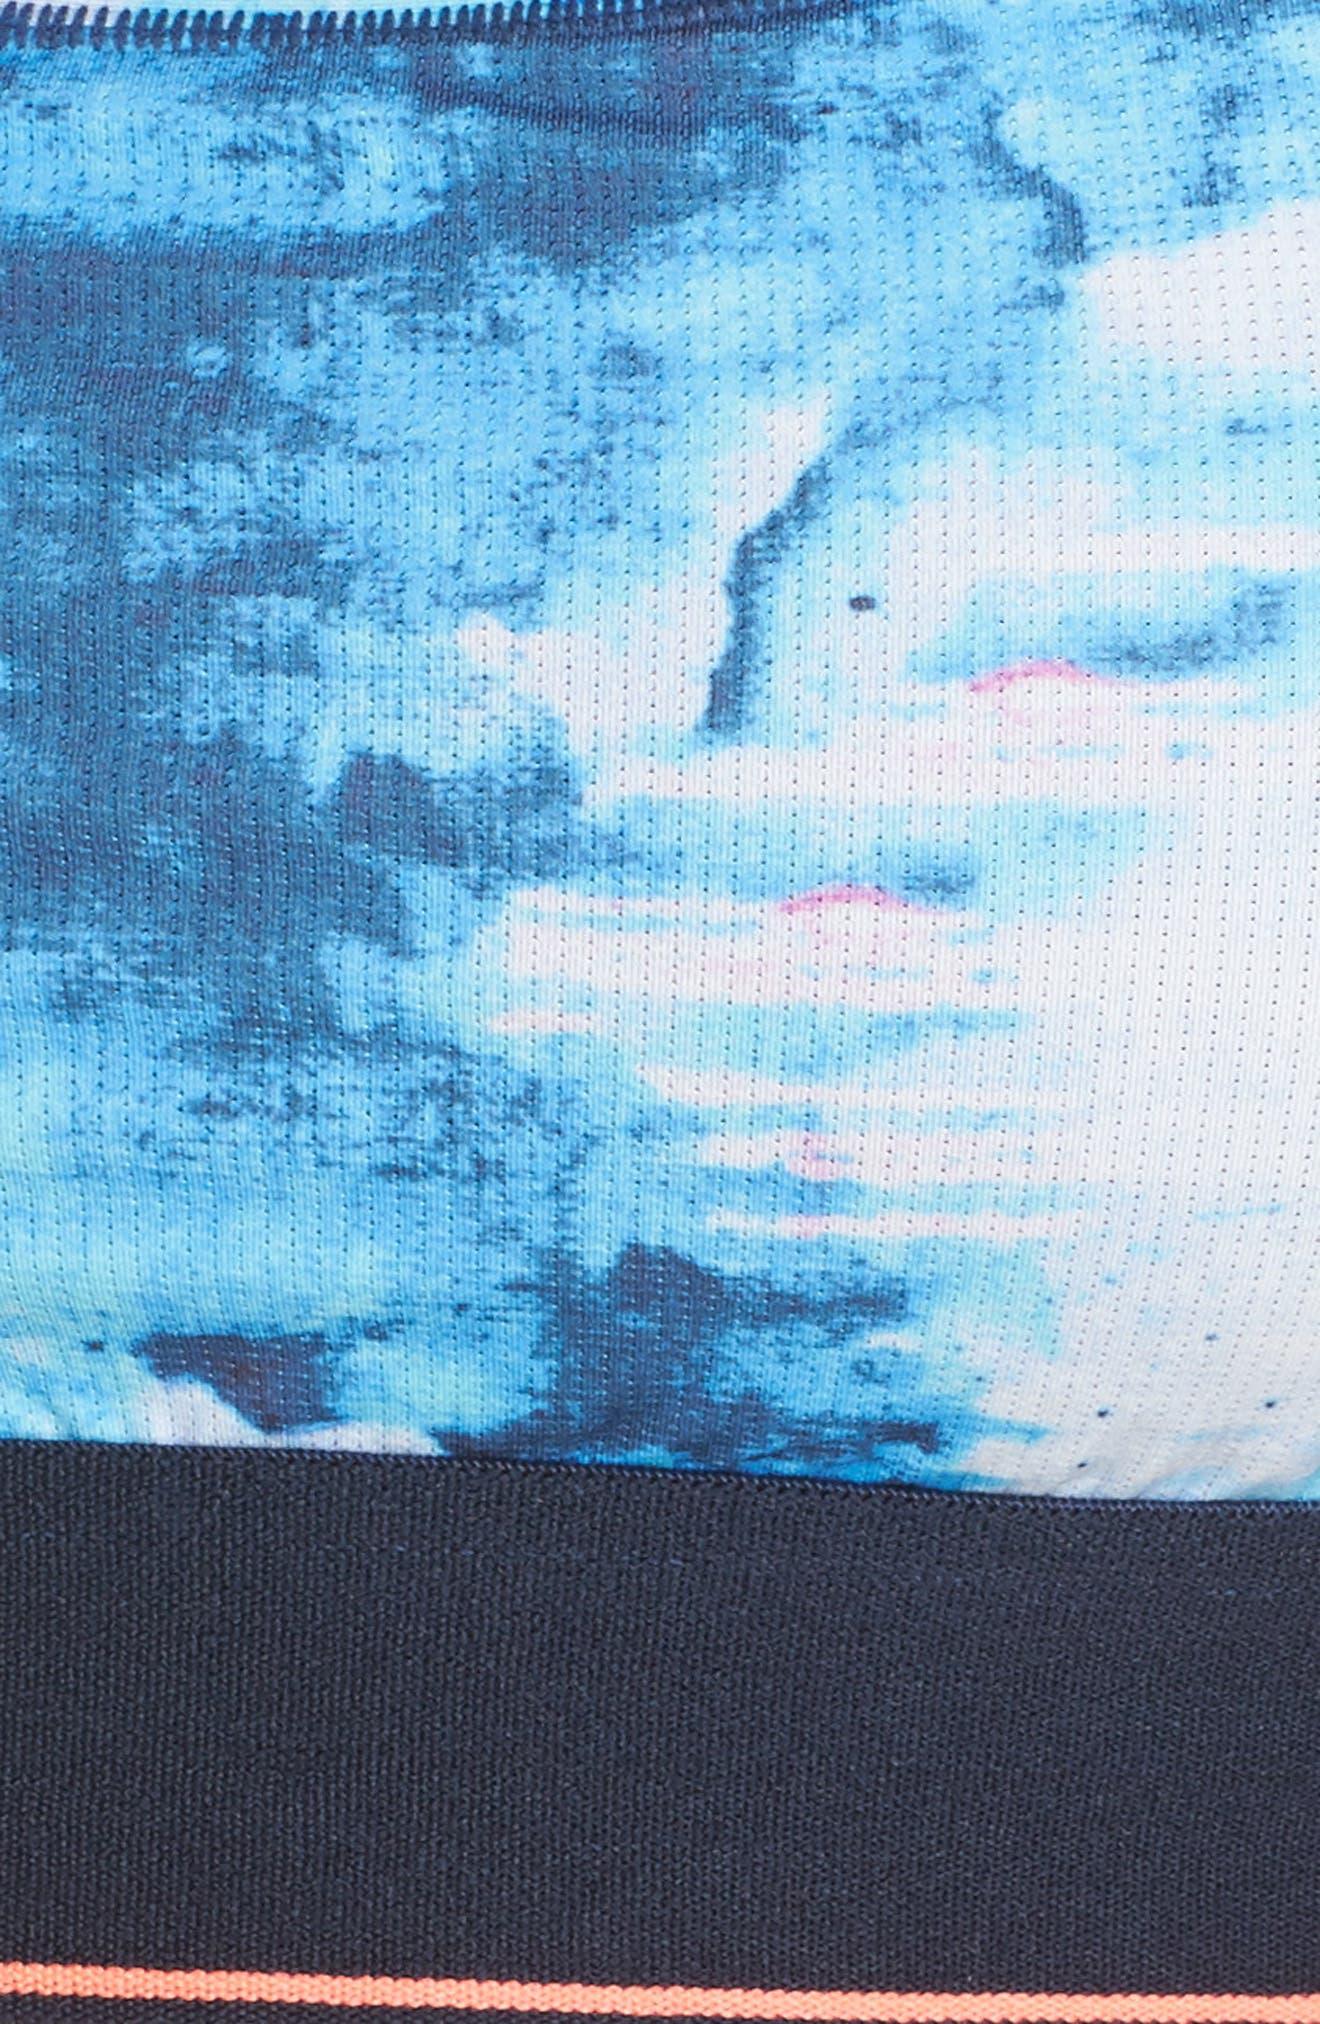 Tropic Storm Tomboy Bralette,                             Alternate thumbnail 6, color,                             410